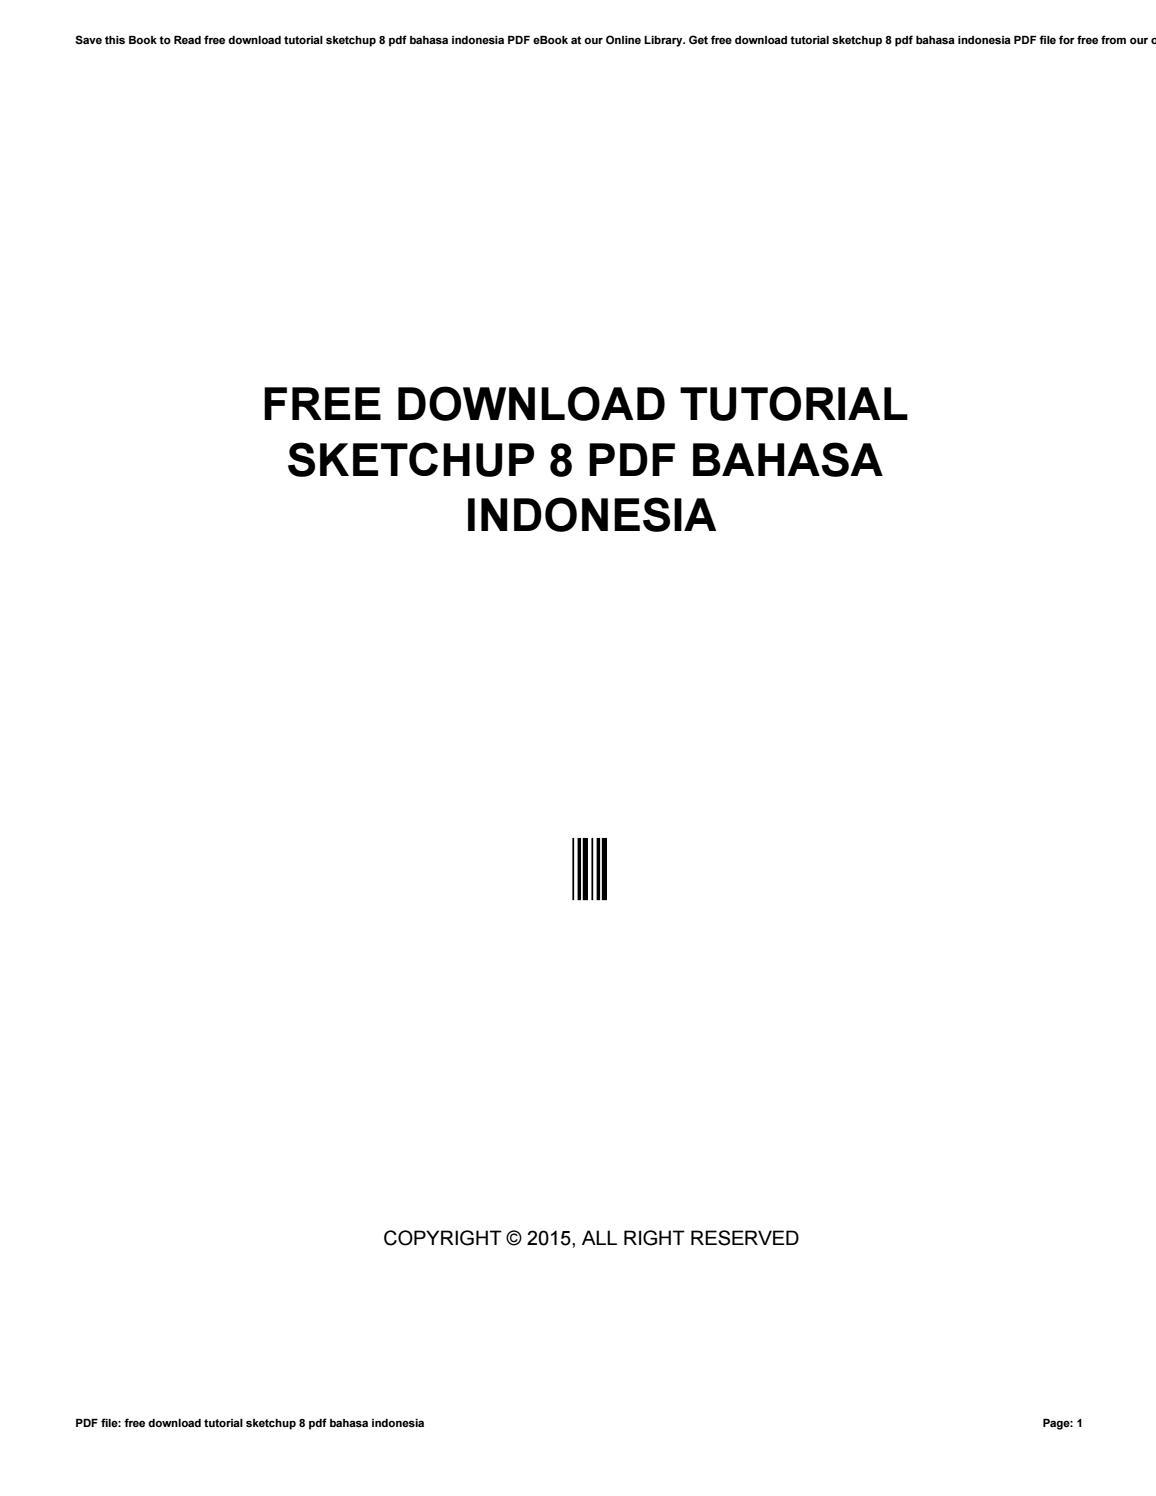 google sketchup 8 tutorial pdf bahasa indonesia